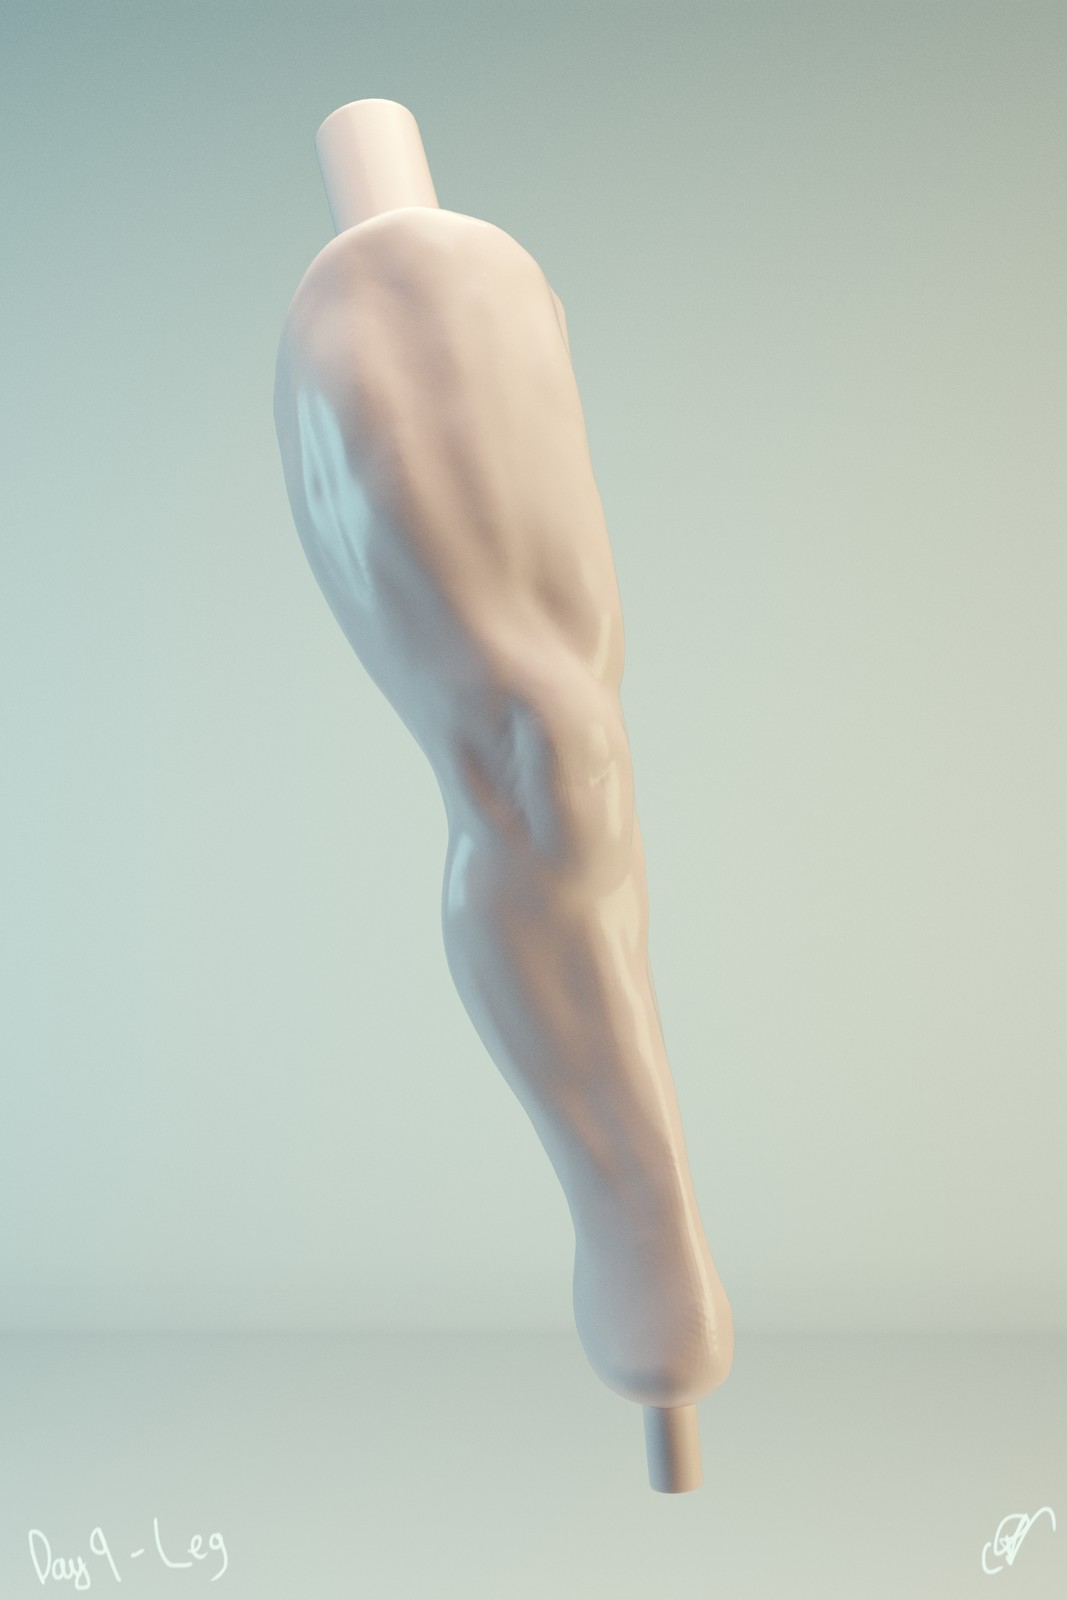 #SculptJanuary Day 9 - Leg